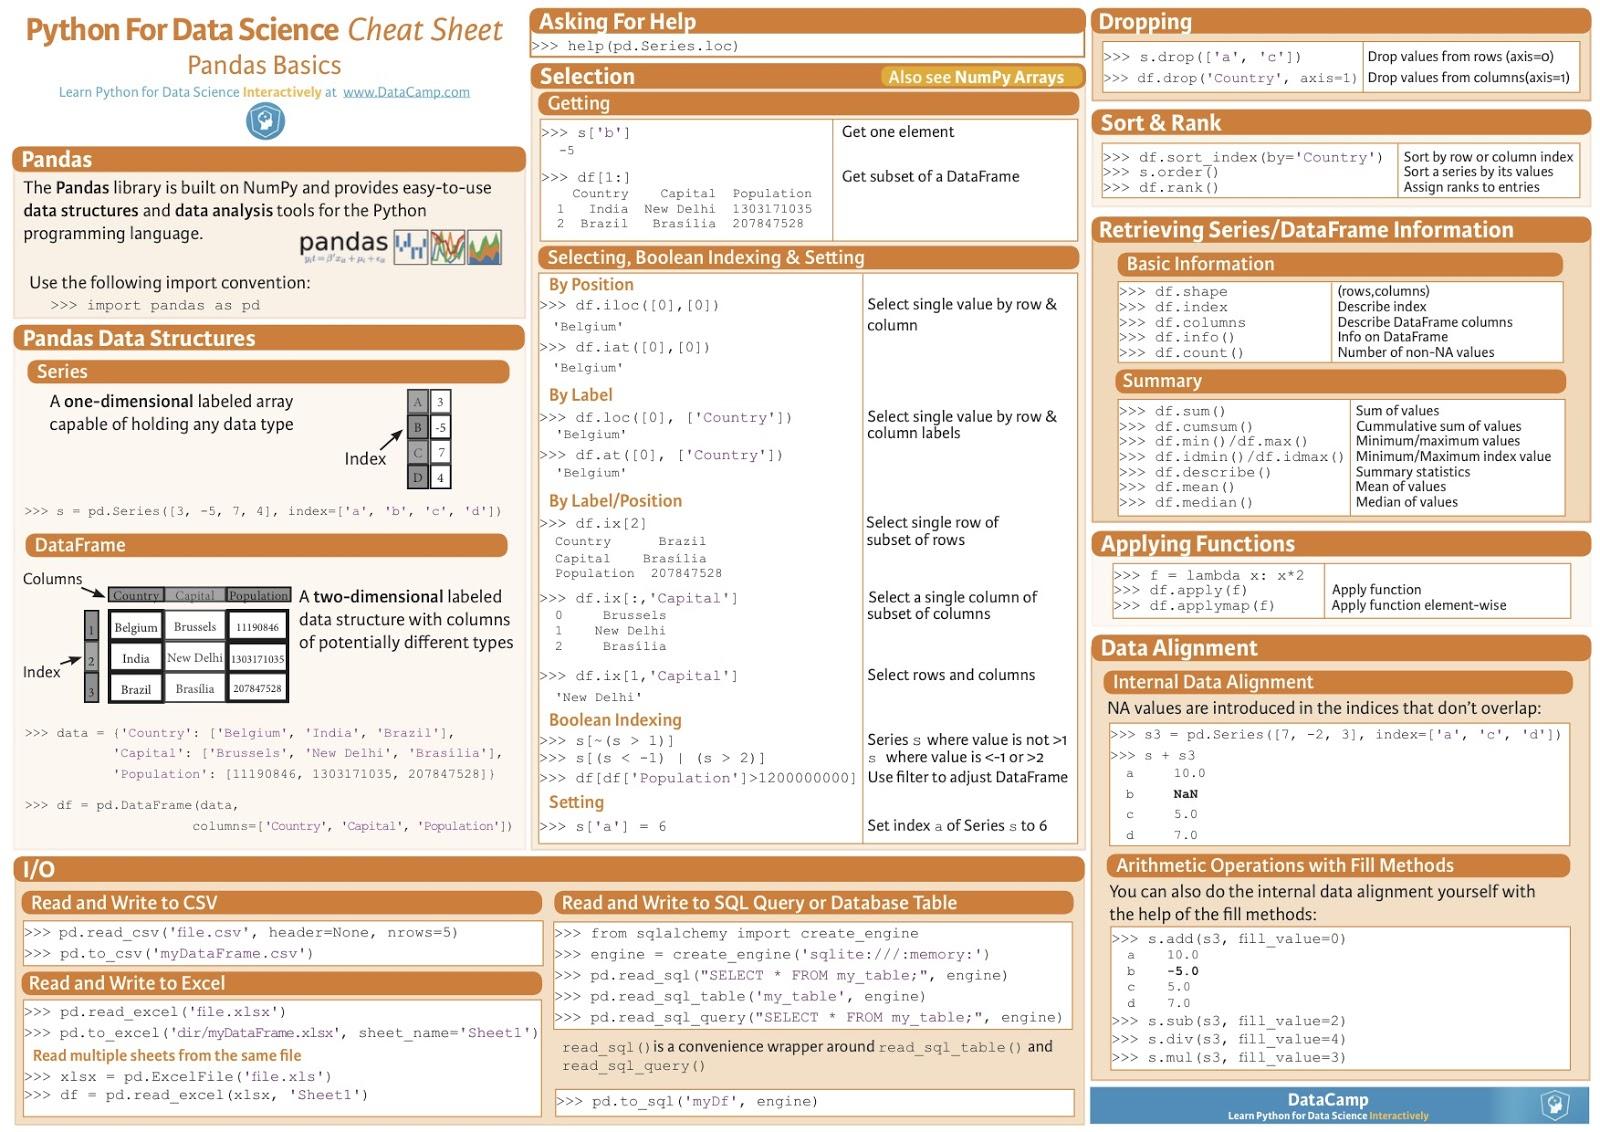 Python Basic, Cheat Sheets & ETL   VelocityOn Learning - Excel/BI